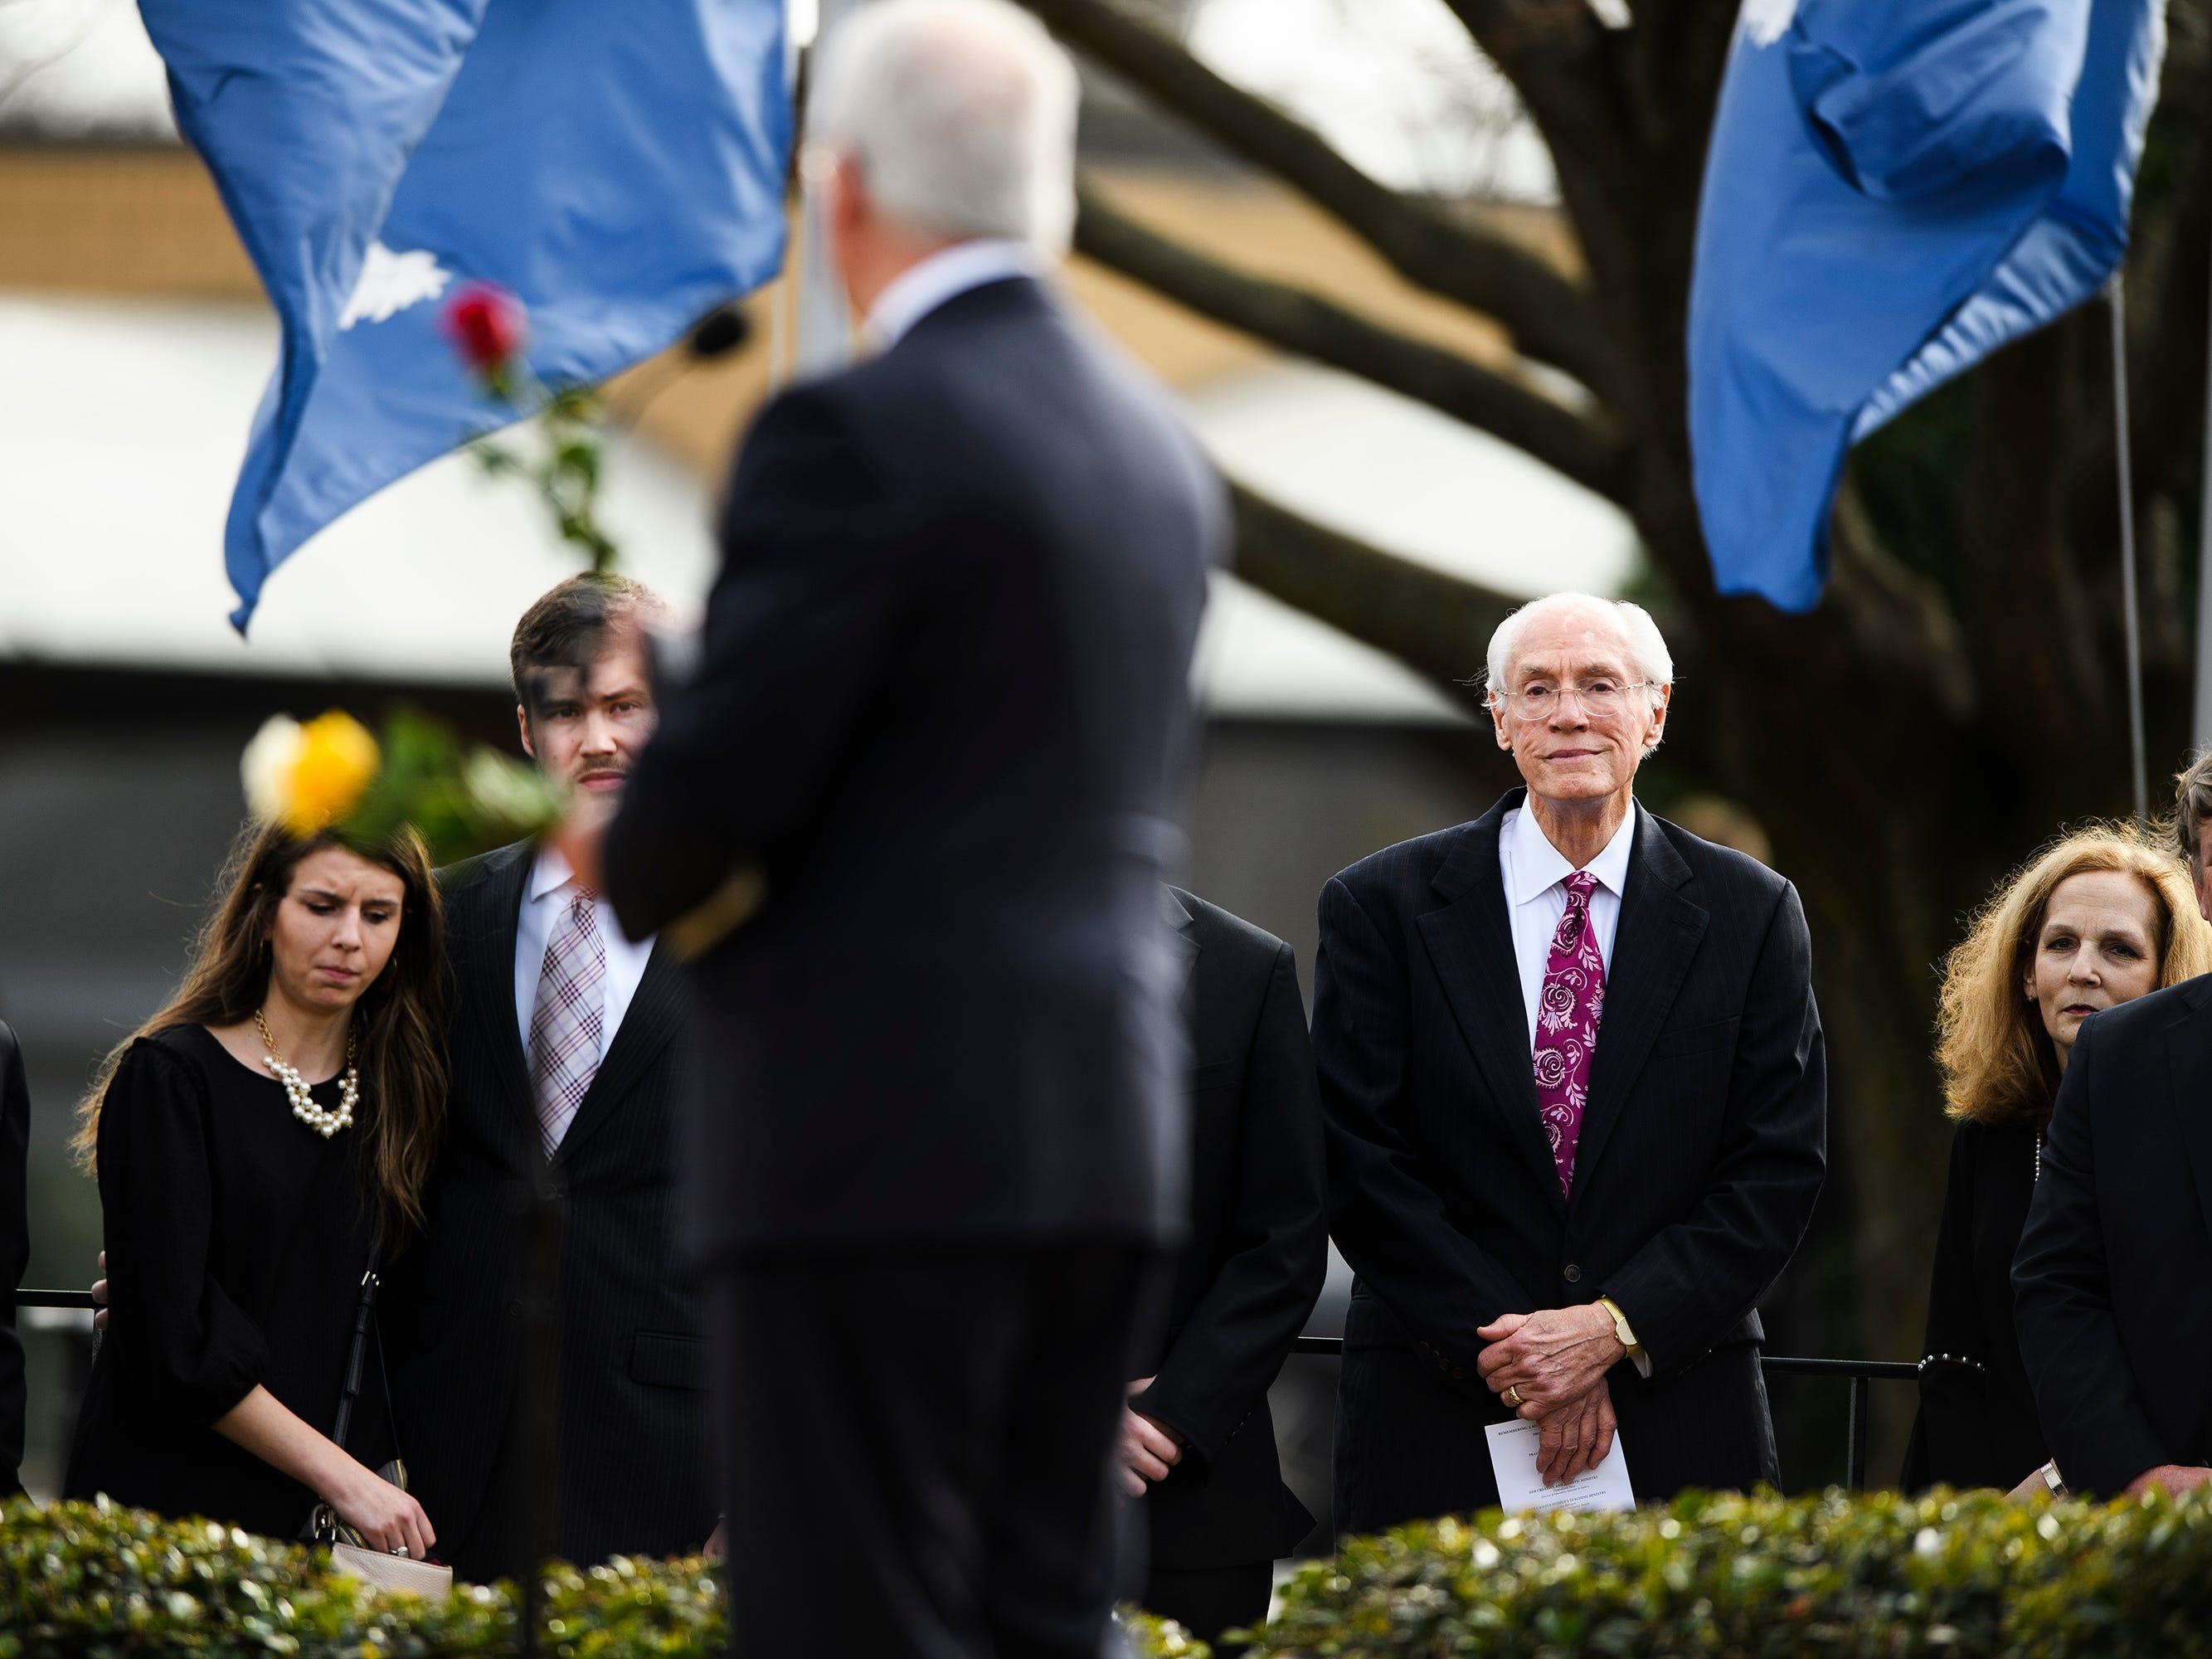 Bob Jones III and other loved ones of Beneth Peters Jones attend Beneth's funeral service at Bob Jones University on Wednesday, Feb. 6, 2019.